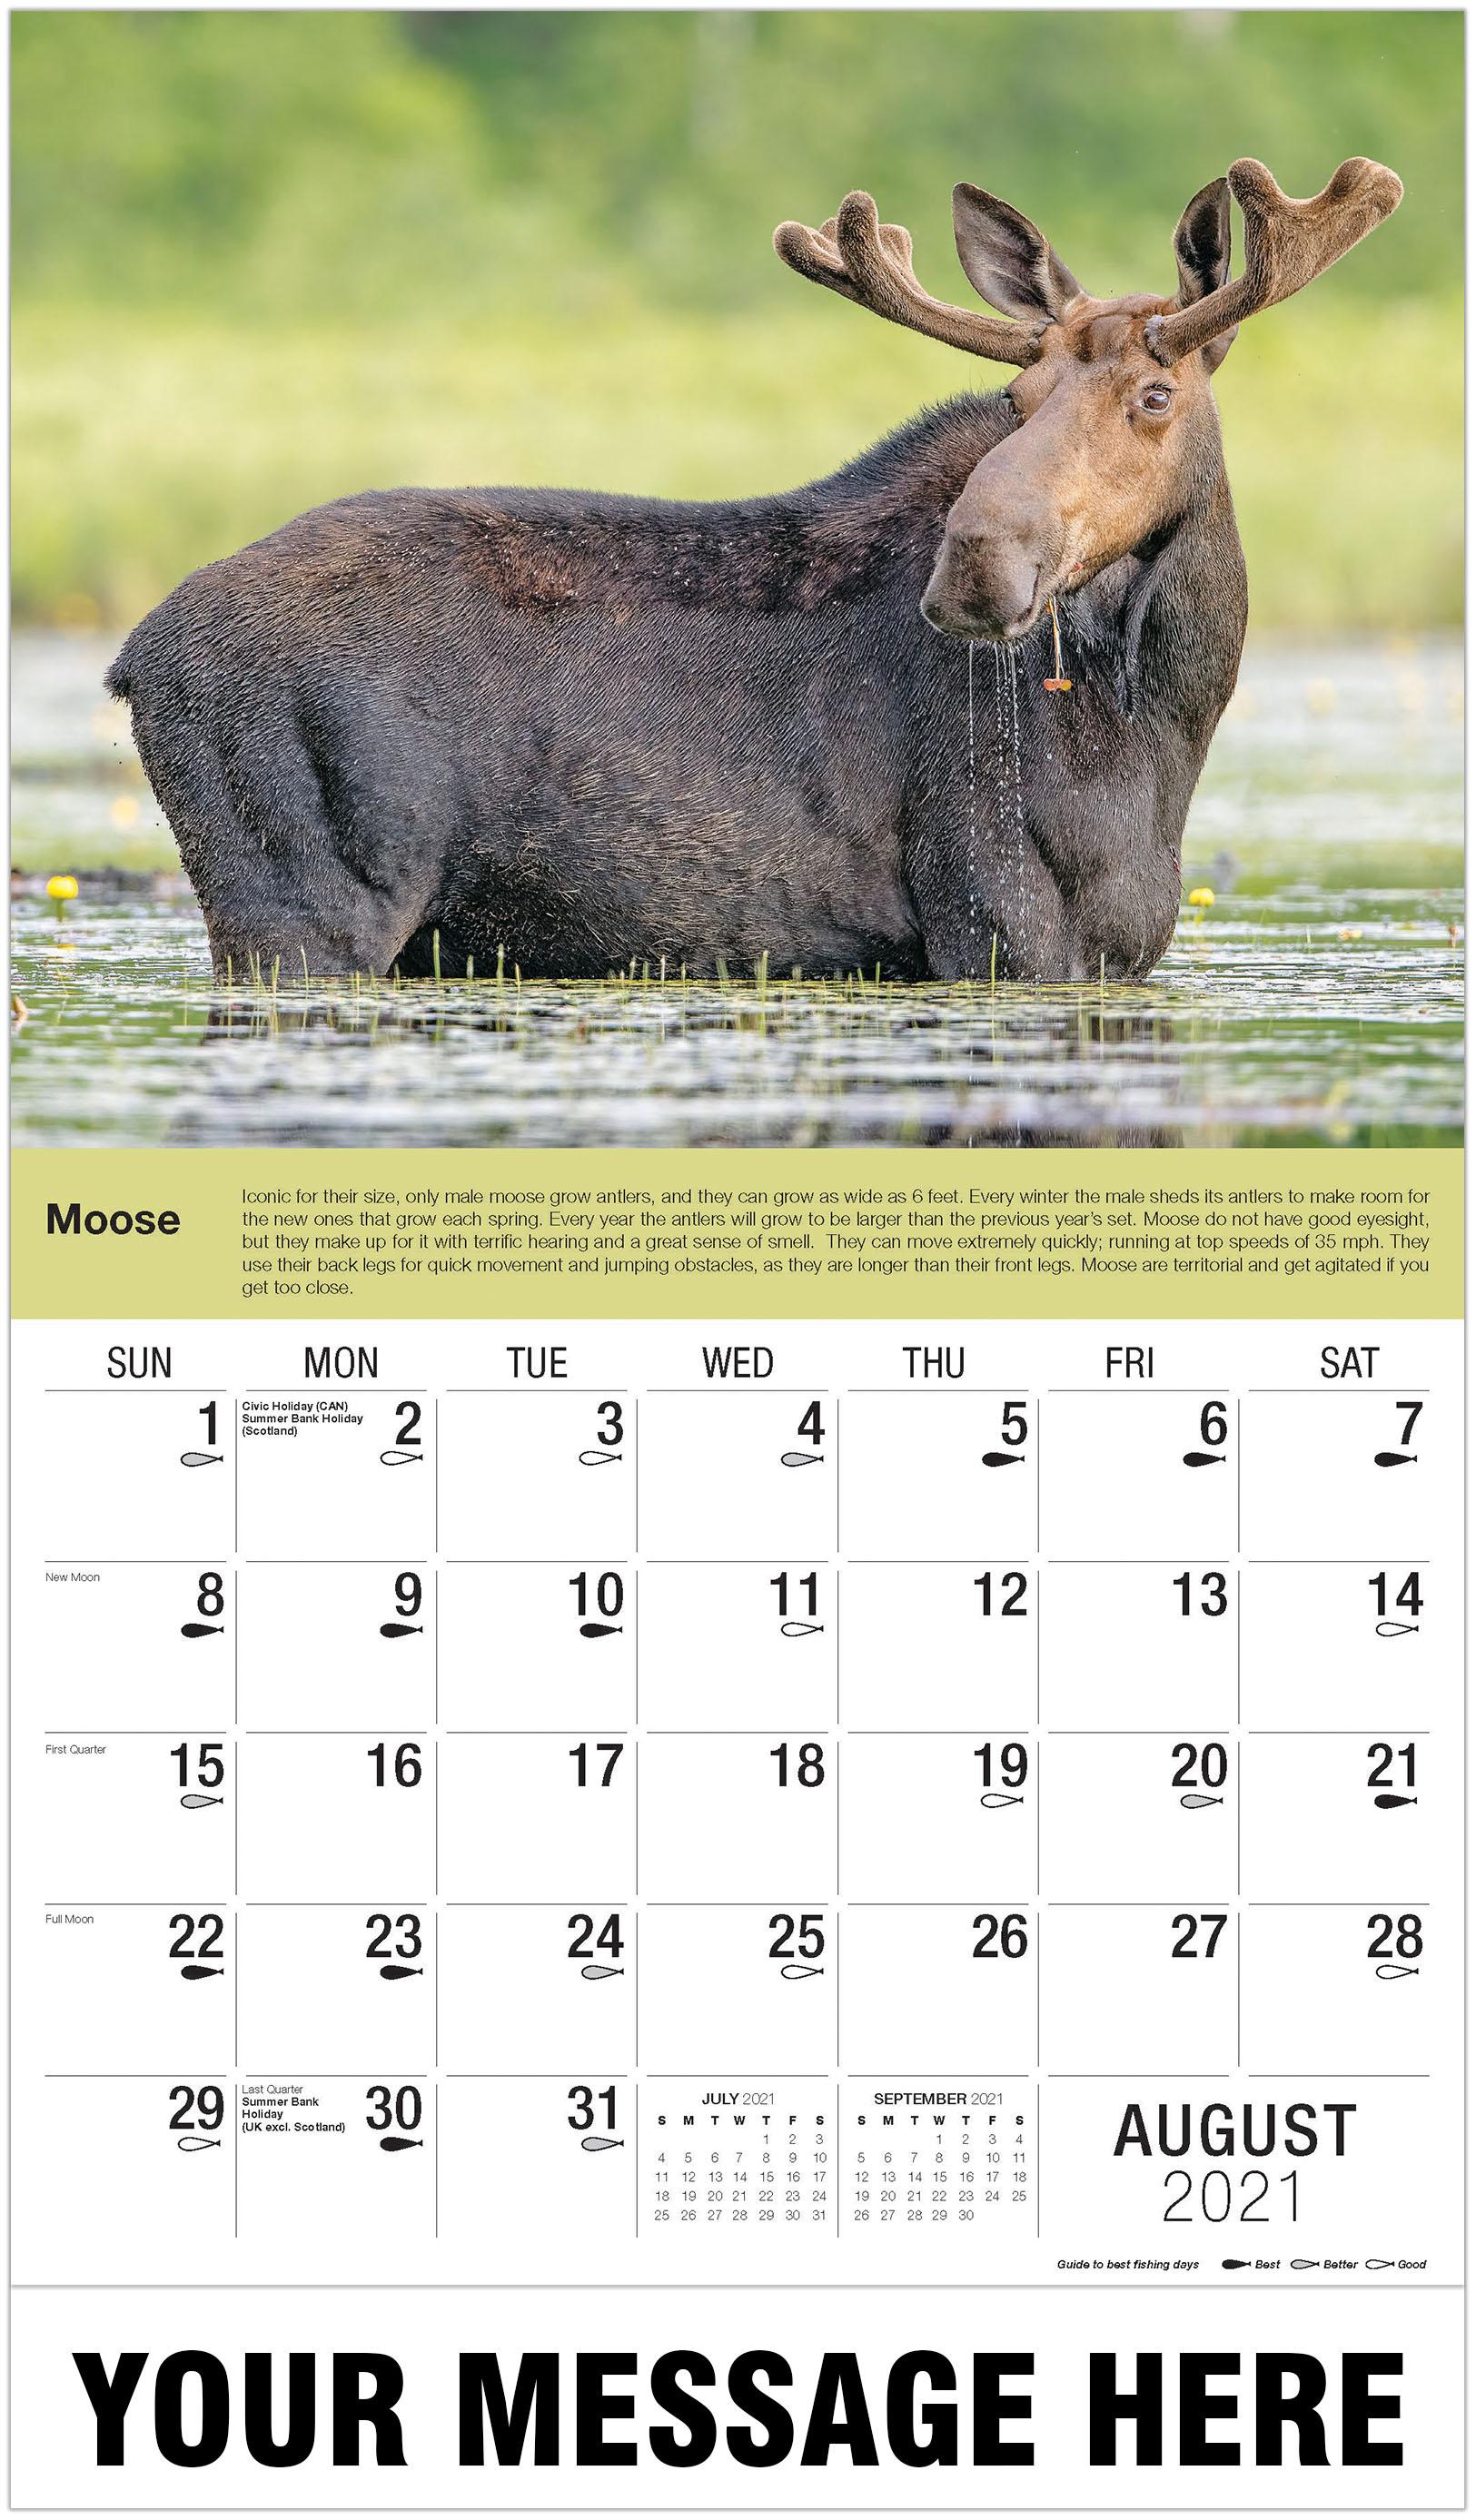 Moose - August - North American Wildlife 2021 Promotional Calendar